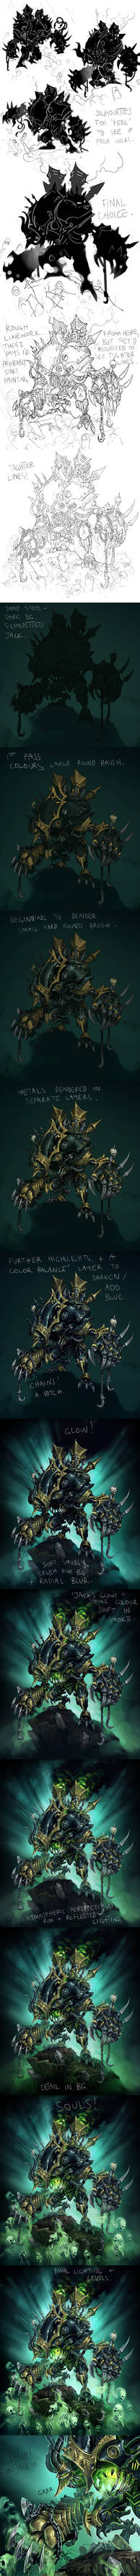 Cryx: DeathJack Process by Mr--Jack